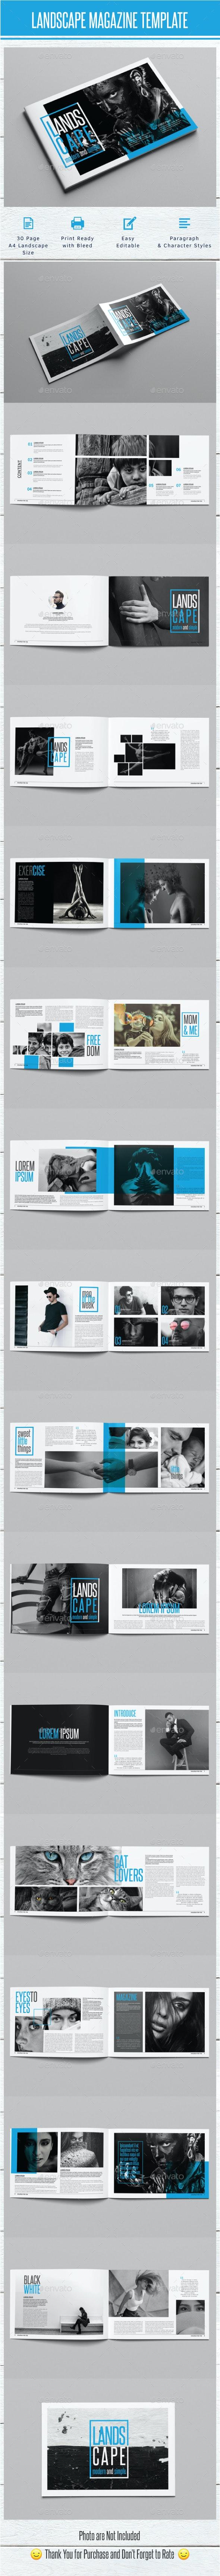 Landscape Monochrome Magazine Template - Magazines Print Templates